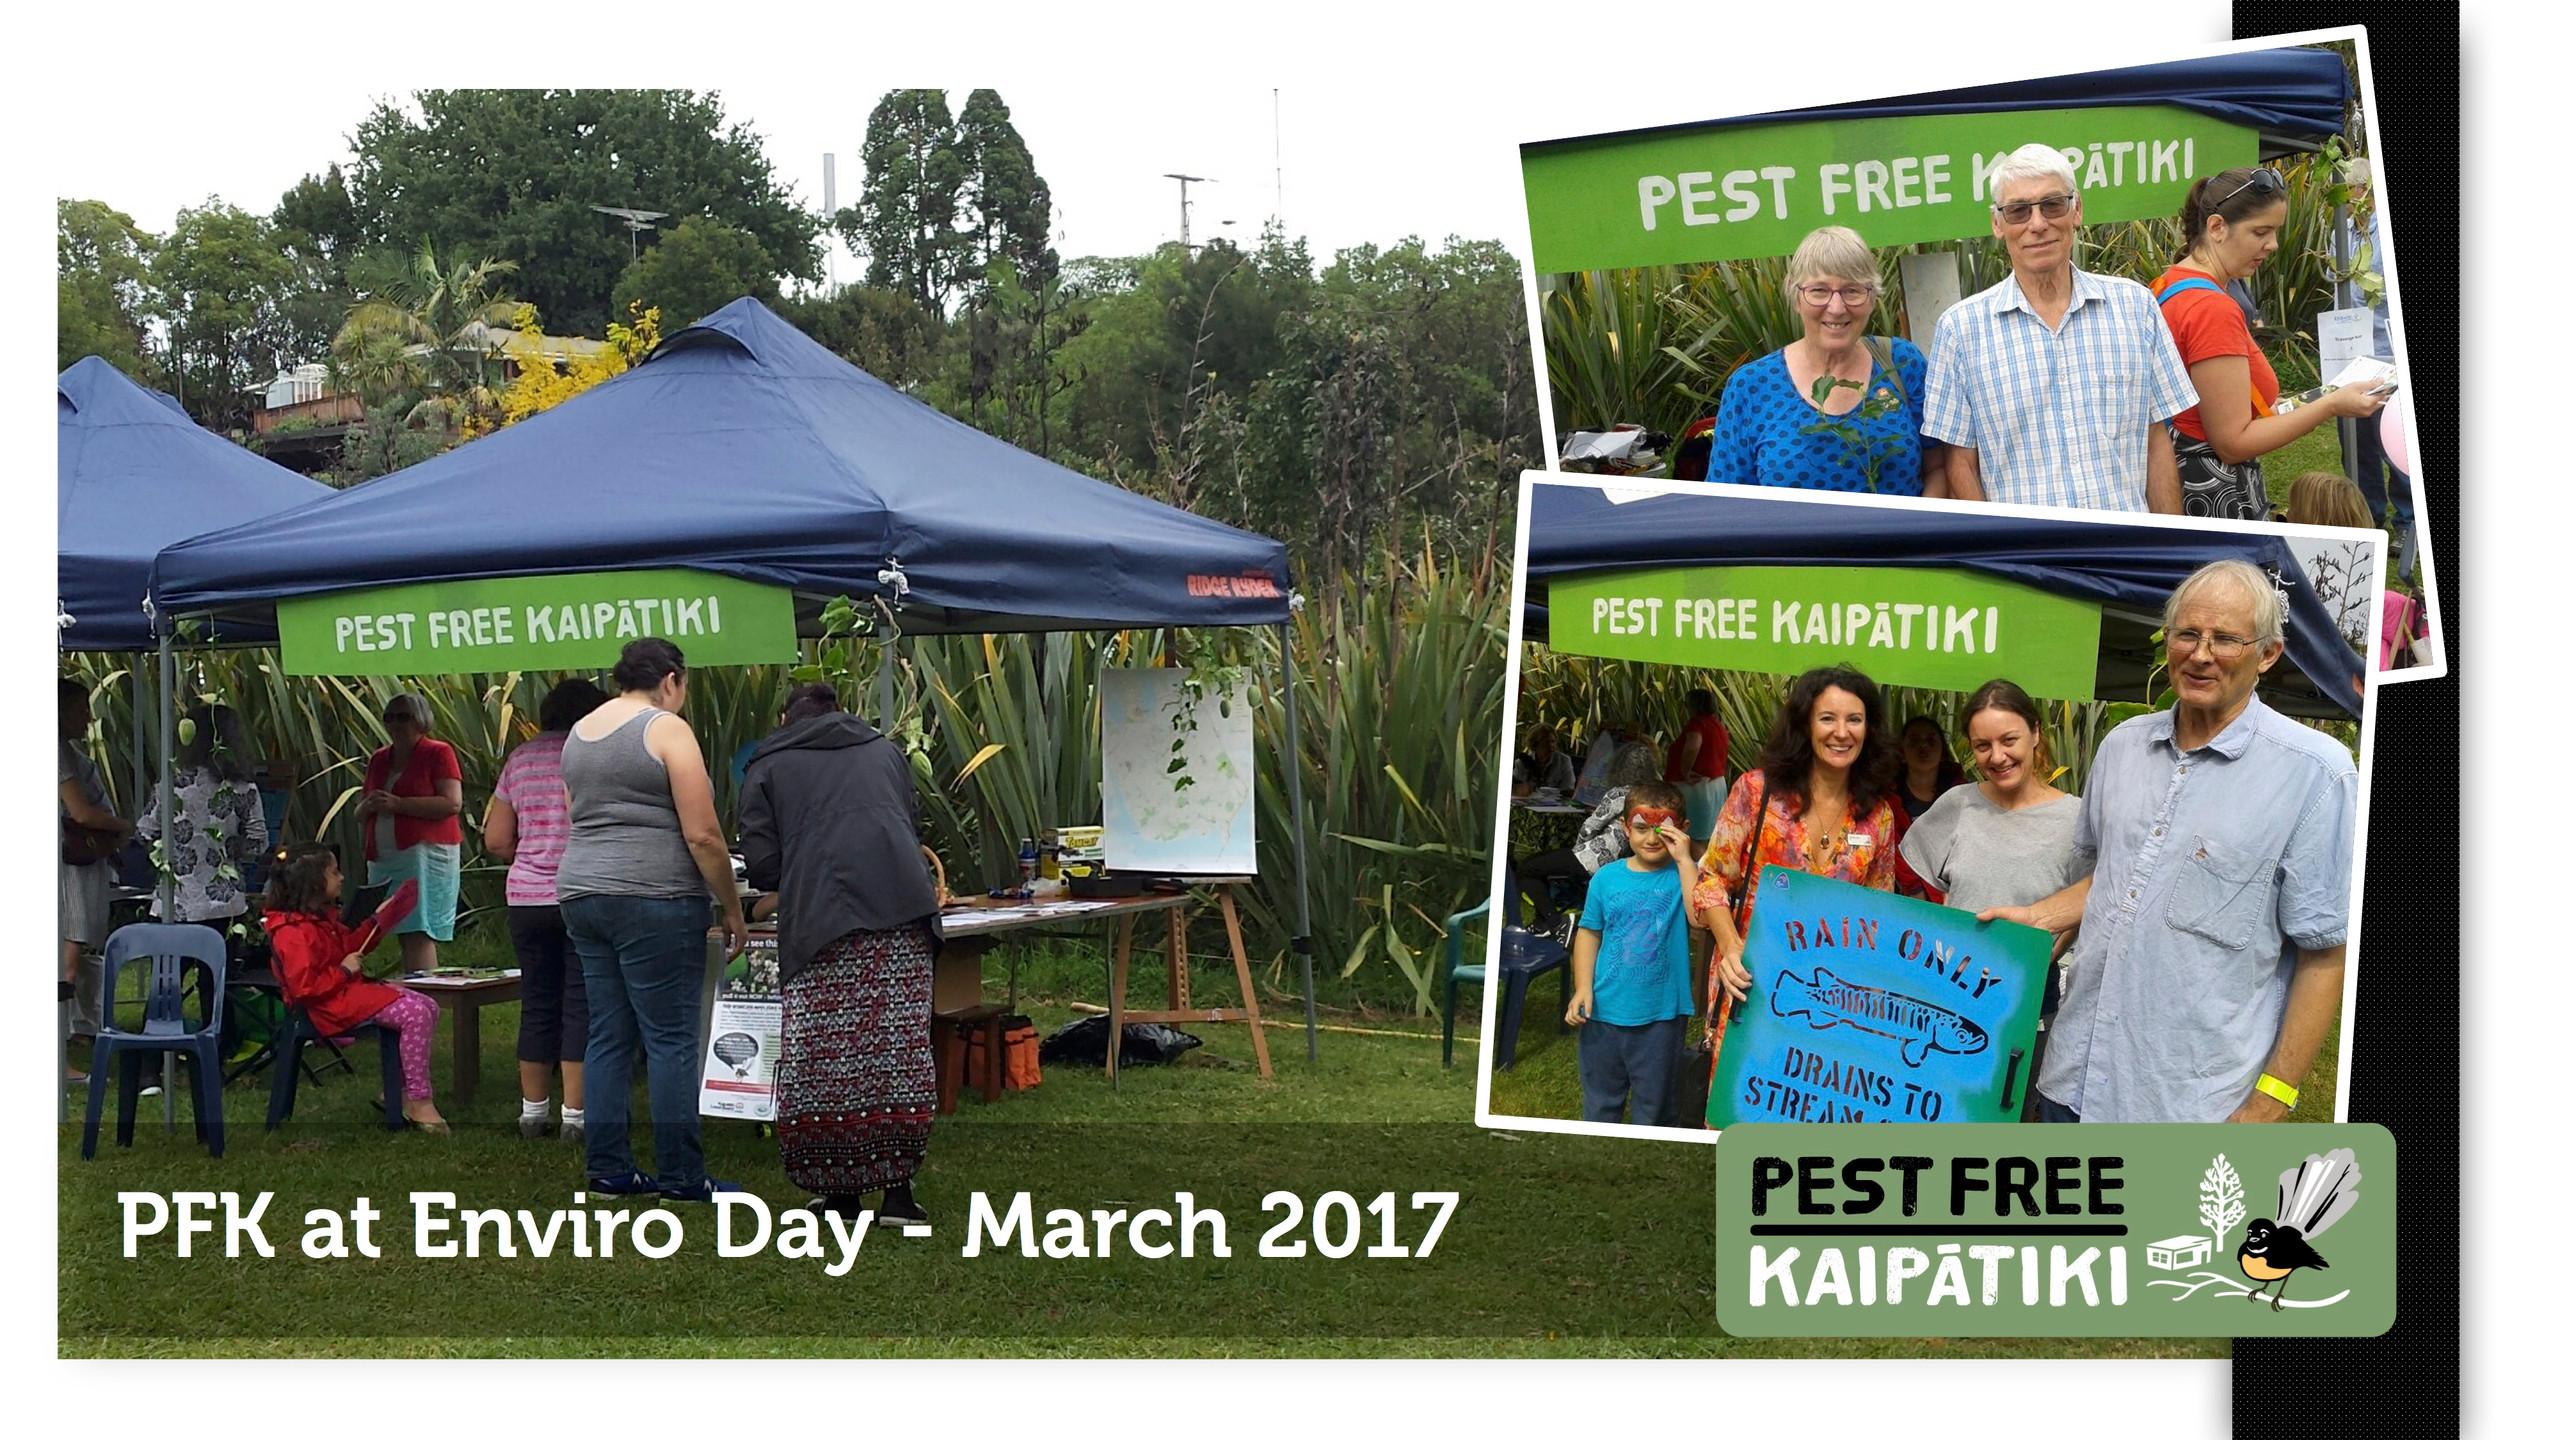 Pest Free Kaipatiki-Pestival-slide17